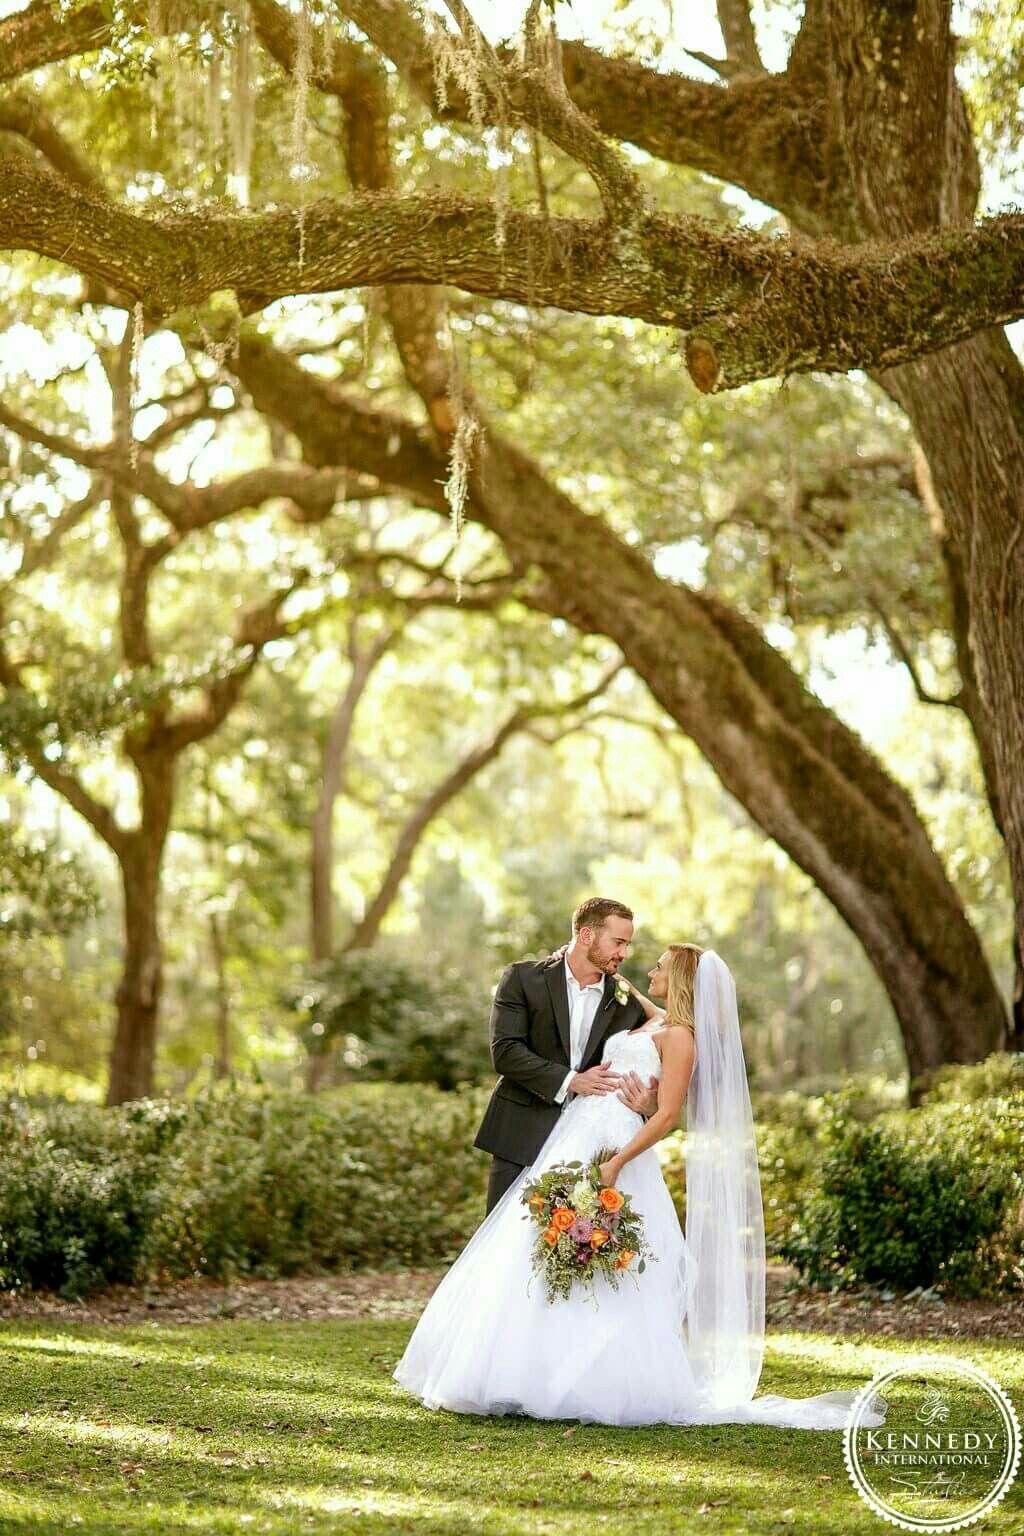 Eden Gardens State Park, Oak tree, fall wedding, outdoor